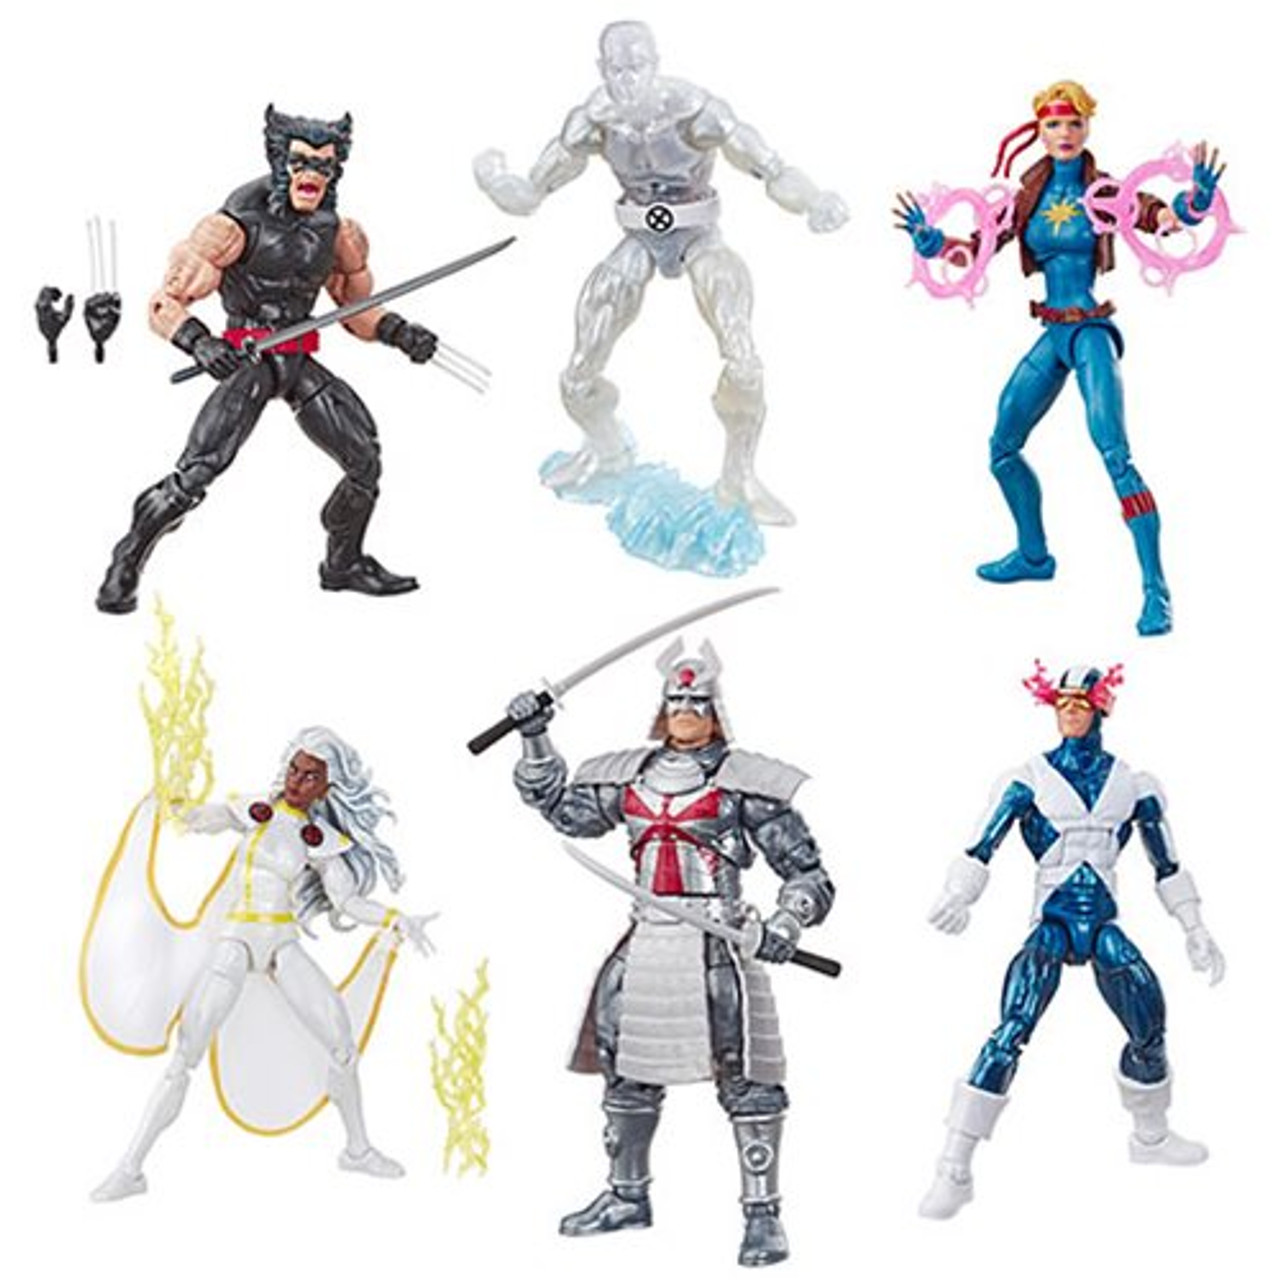 X Men Legends 90s Havok and Polaris 6-Inch Action Figures Set